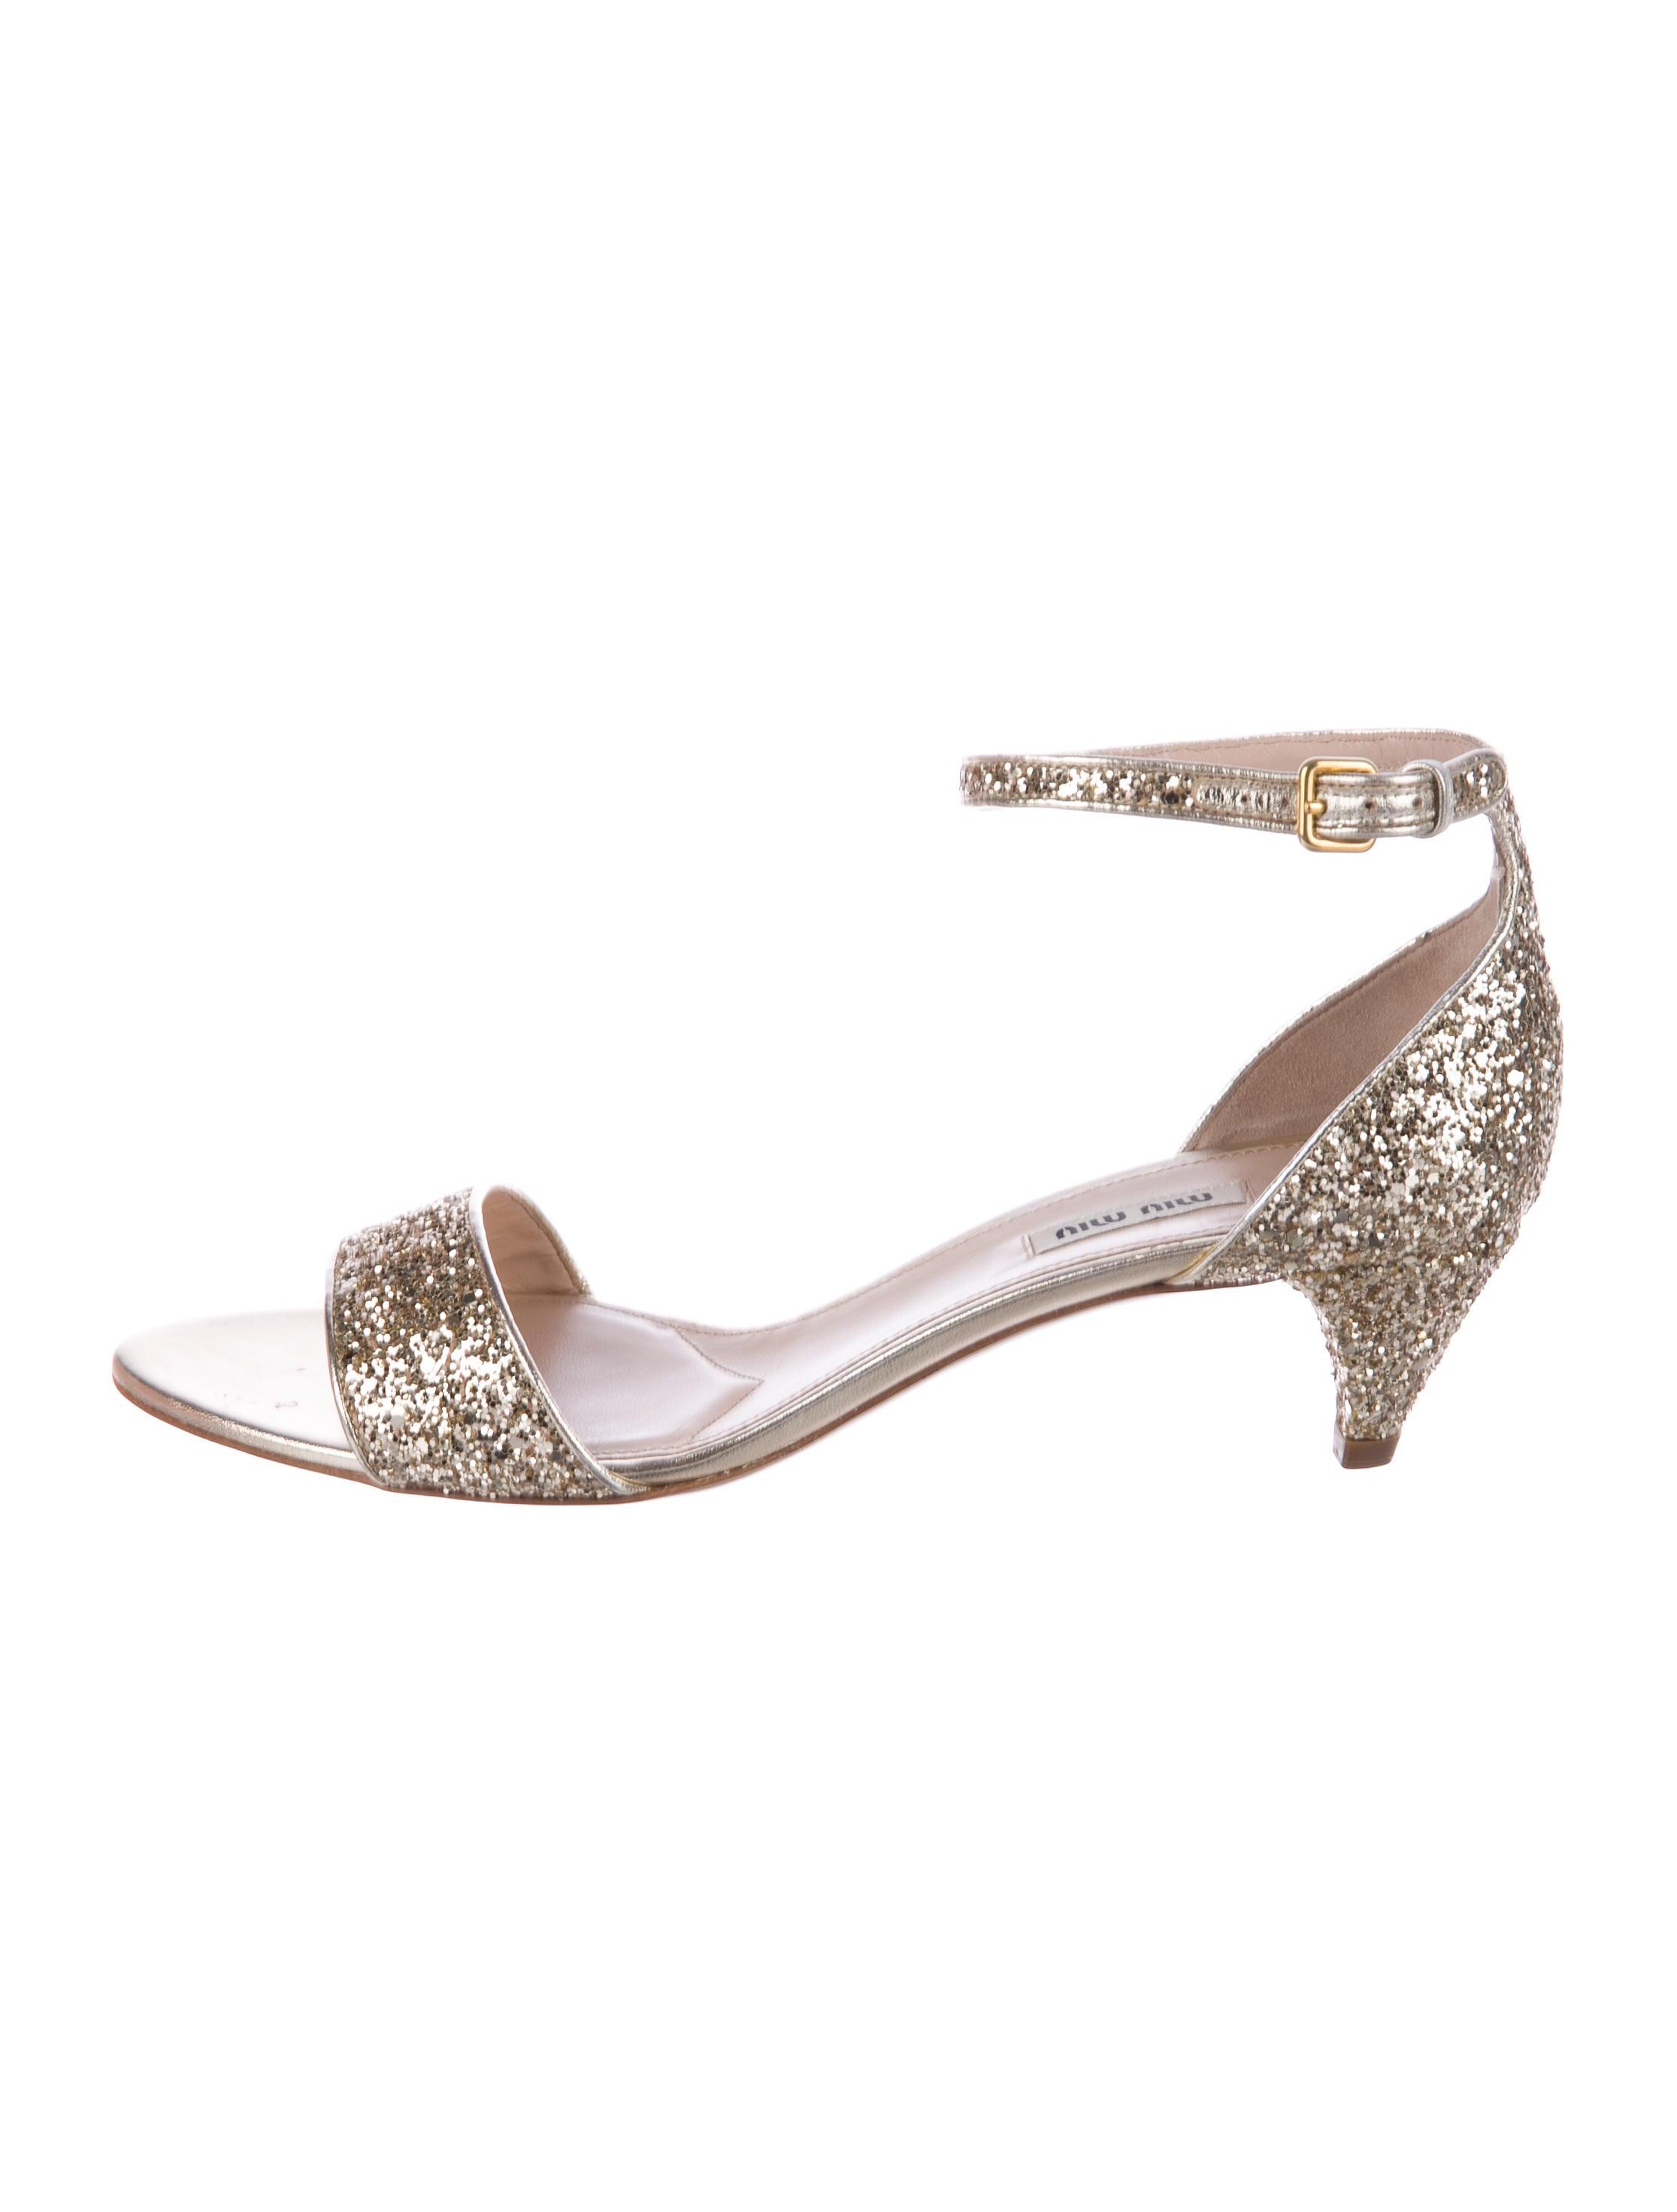 Miu Miu Glitter Ankle Strap Sandals w/ Tags discount sale very cheap online woivnyLT7y